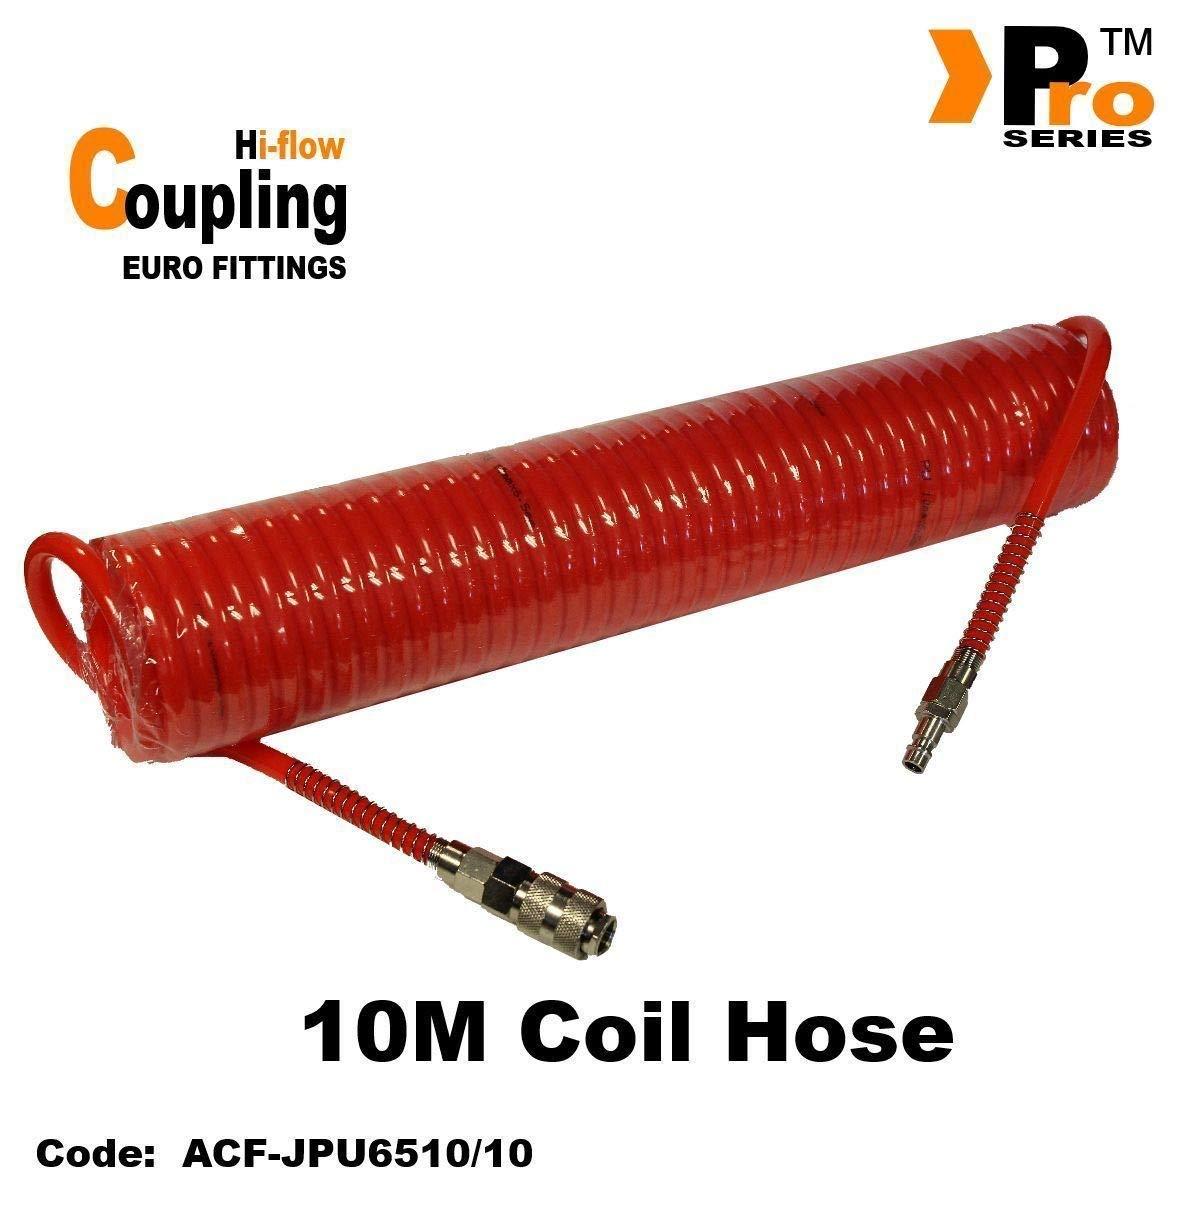 7.5m Orange Coil Hose with Euro Coupling Hi Flow Hi-Flow /& Euro Tail